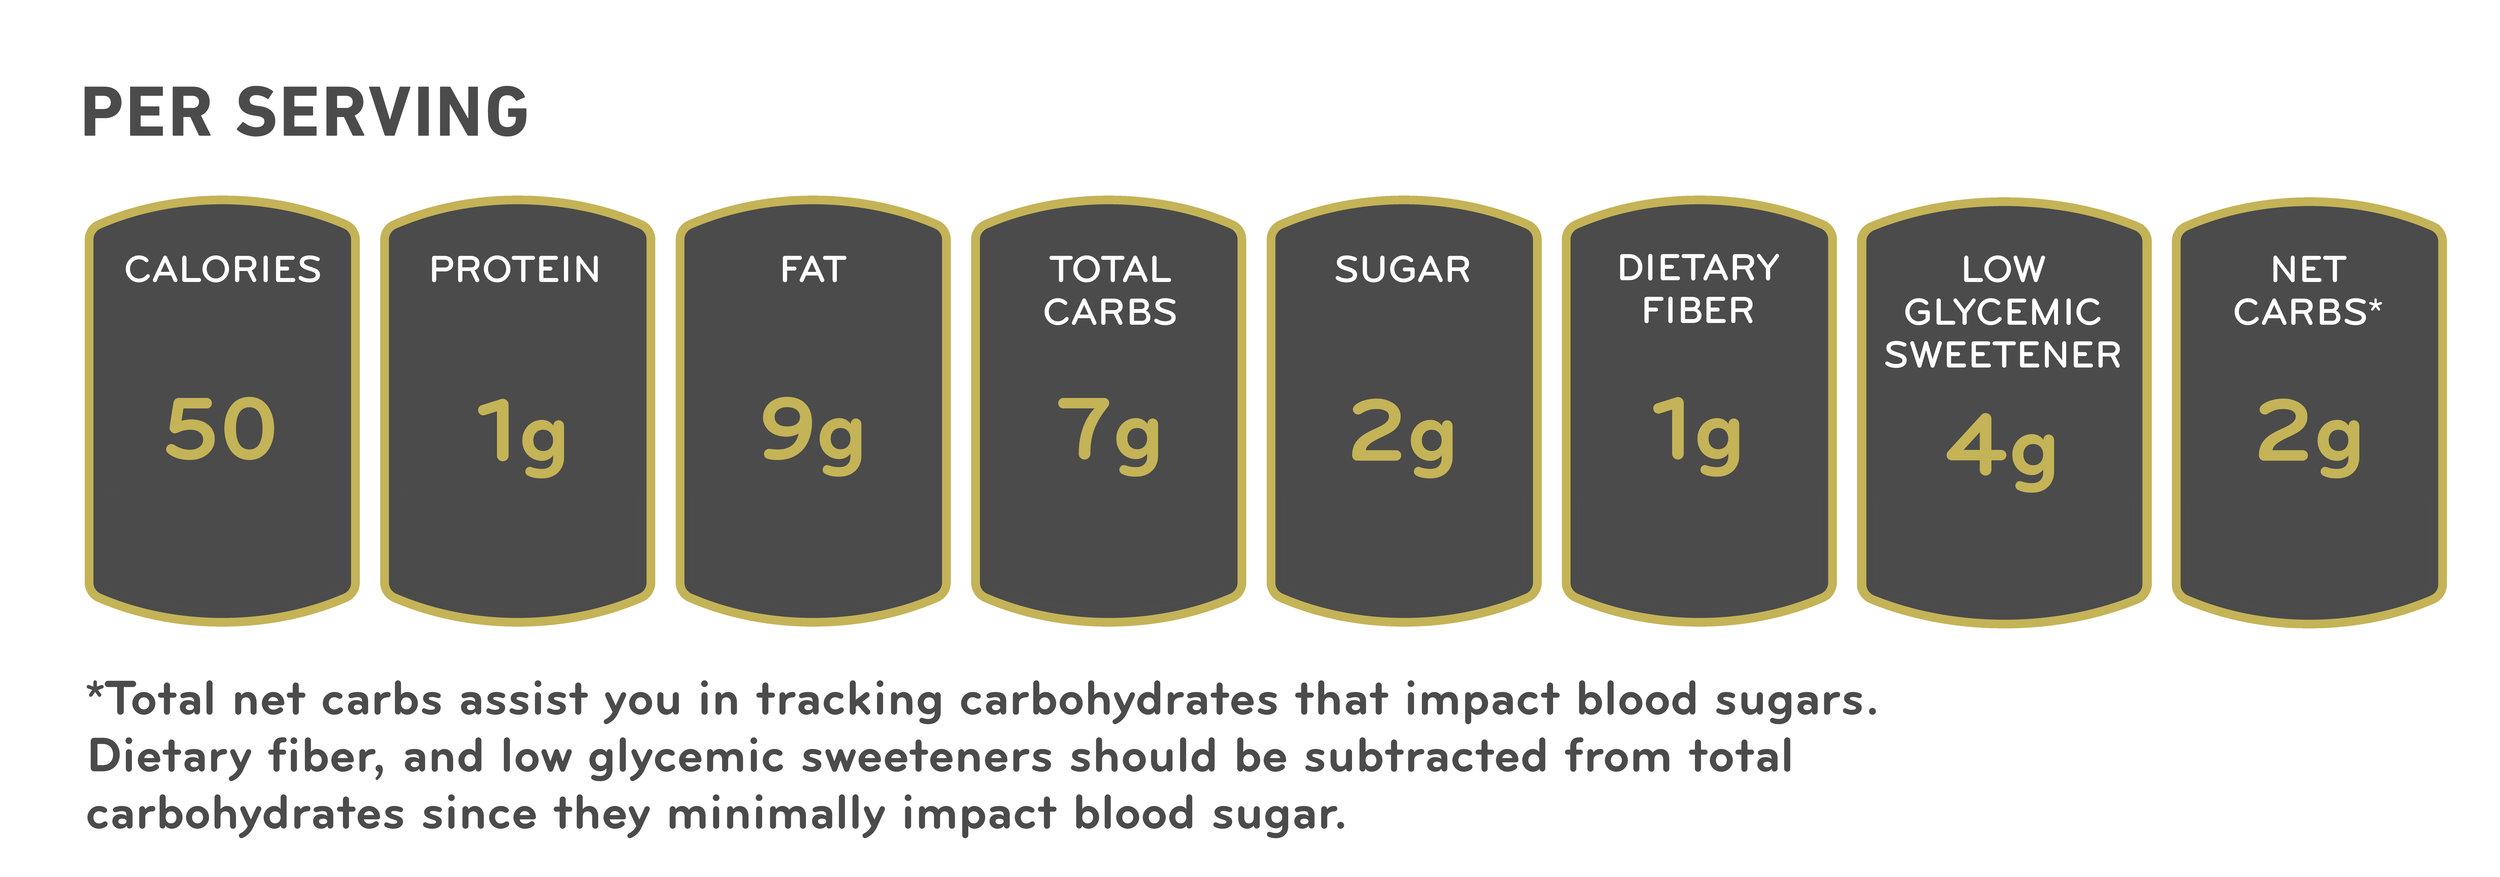 LOW CARB KETO STRAWBERRY SANTA SWEET TREATS RECIPE NUTRITION FACTS.jpg